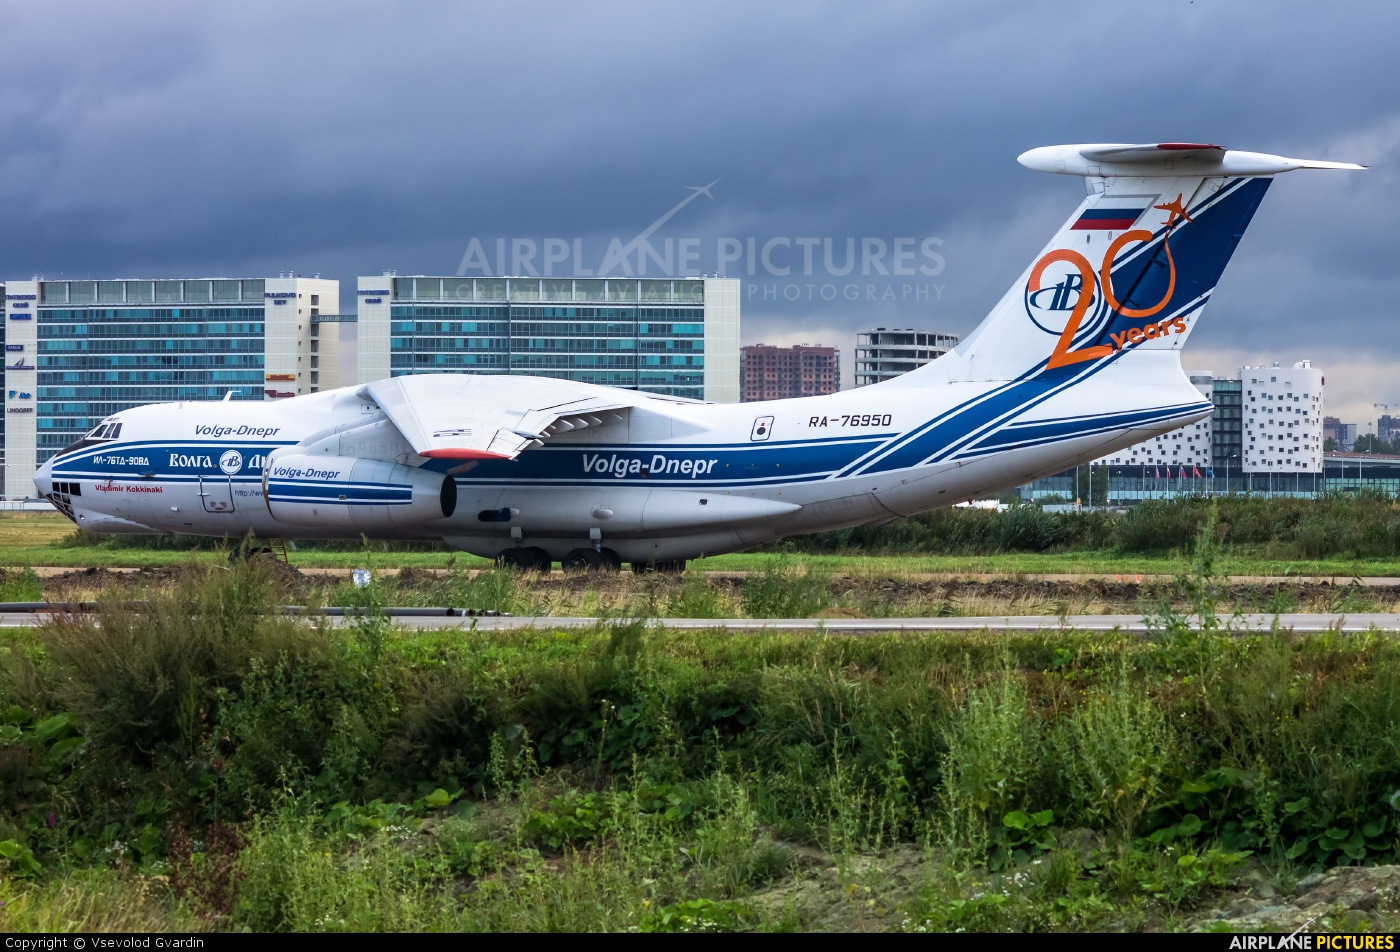 Volga Dnepr Airlines RA-76950 aircraft at St. Petersburg - Pulkovo